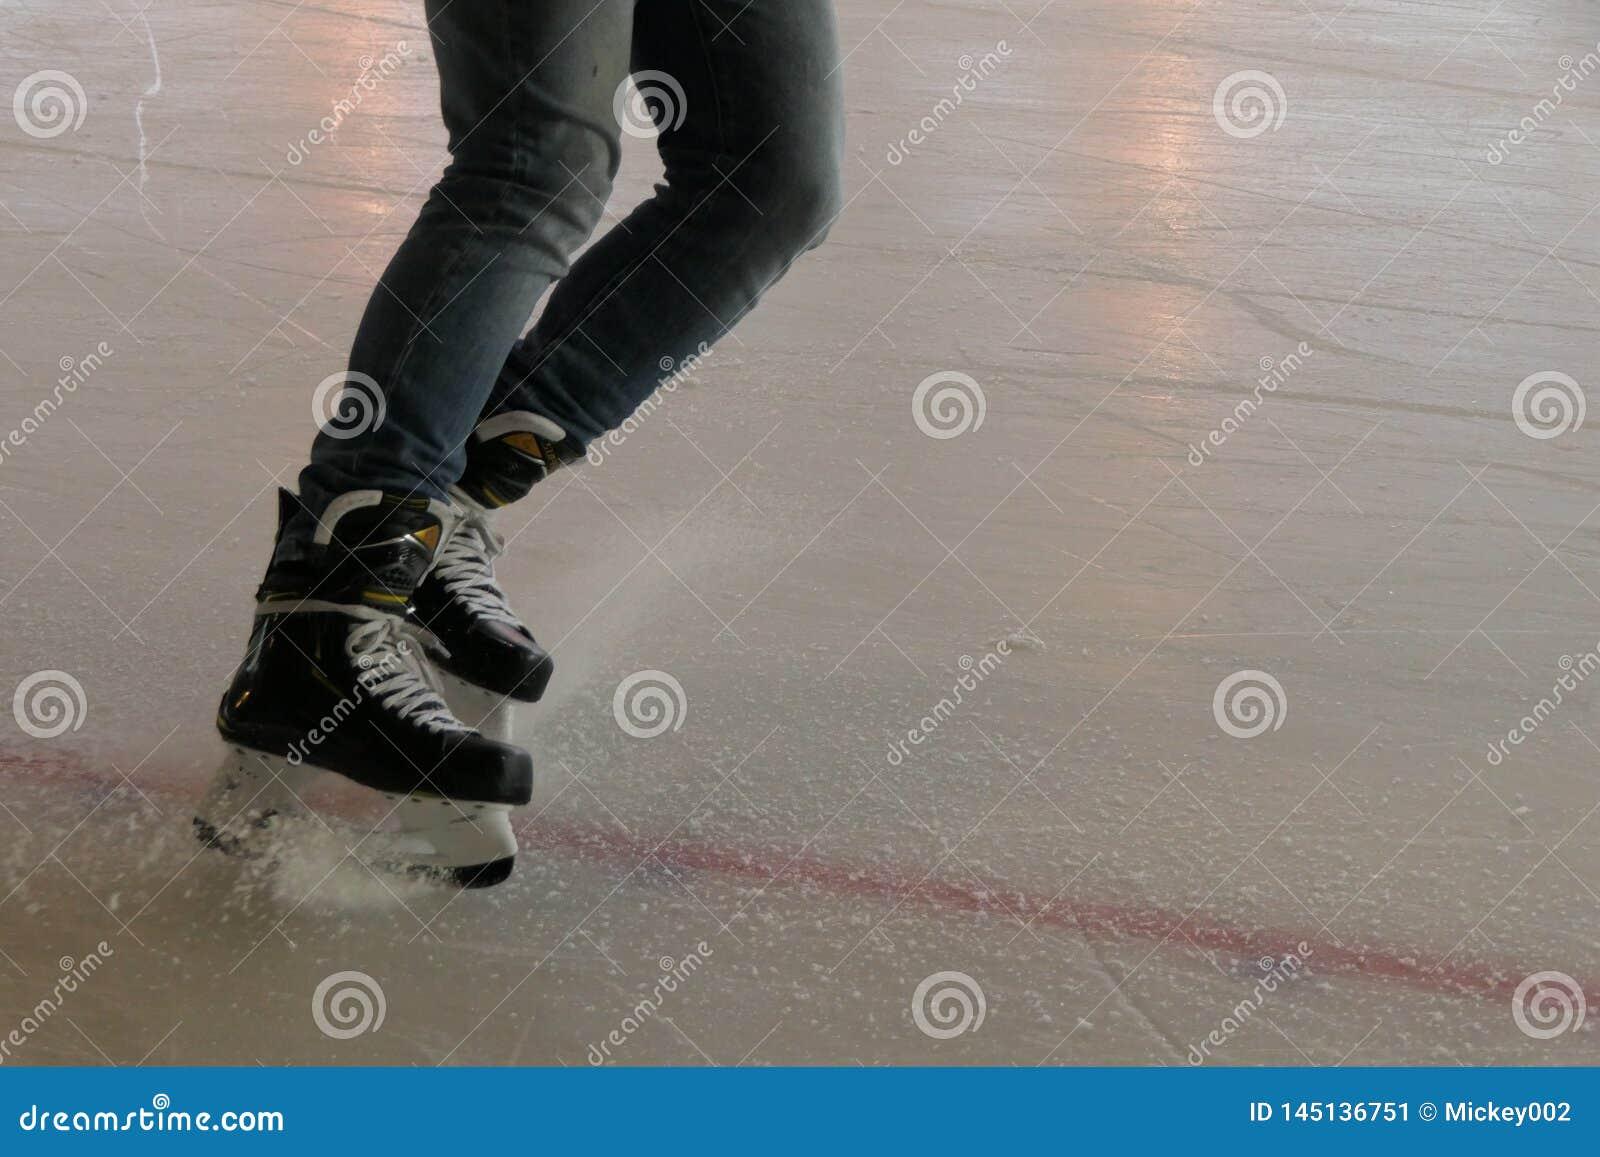 Hockey stop, breaking on ice